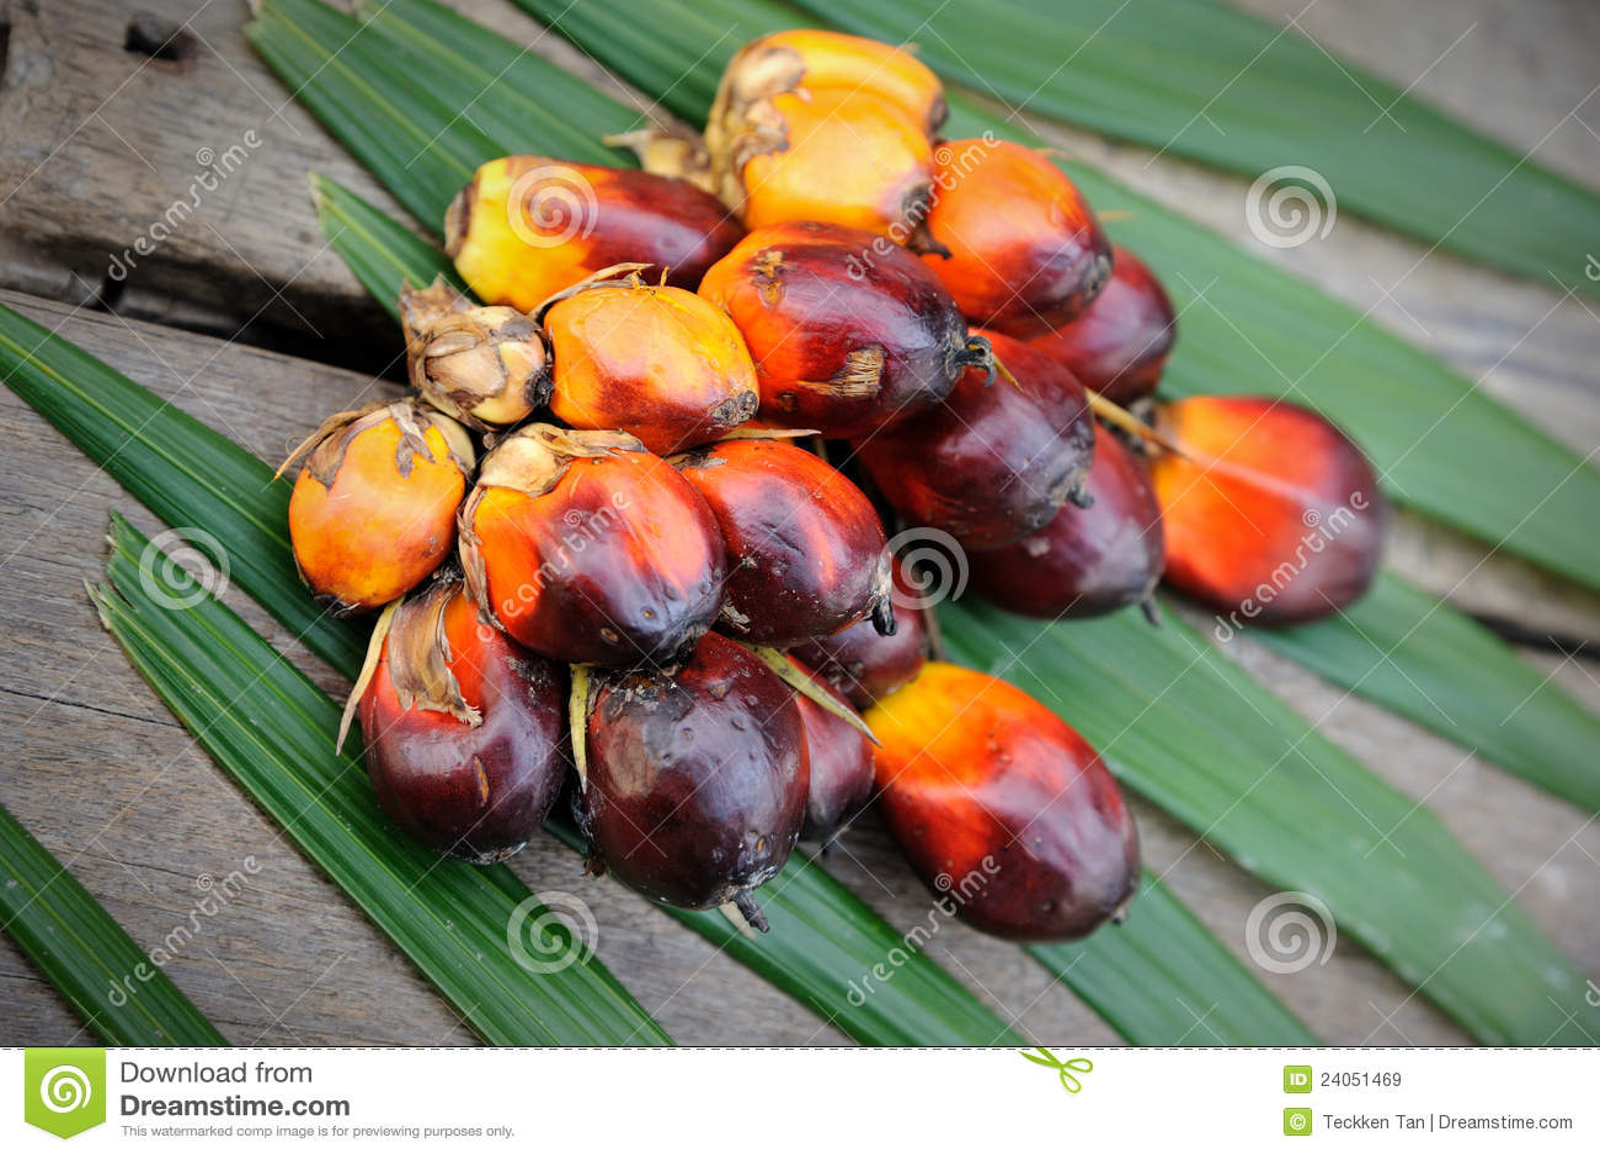 is palm fruit oil healthy fruit ninja online